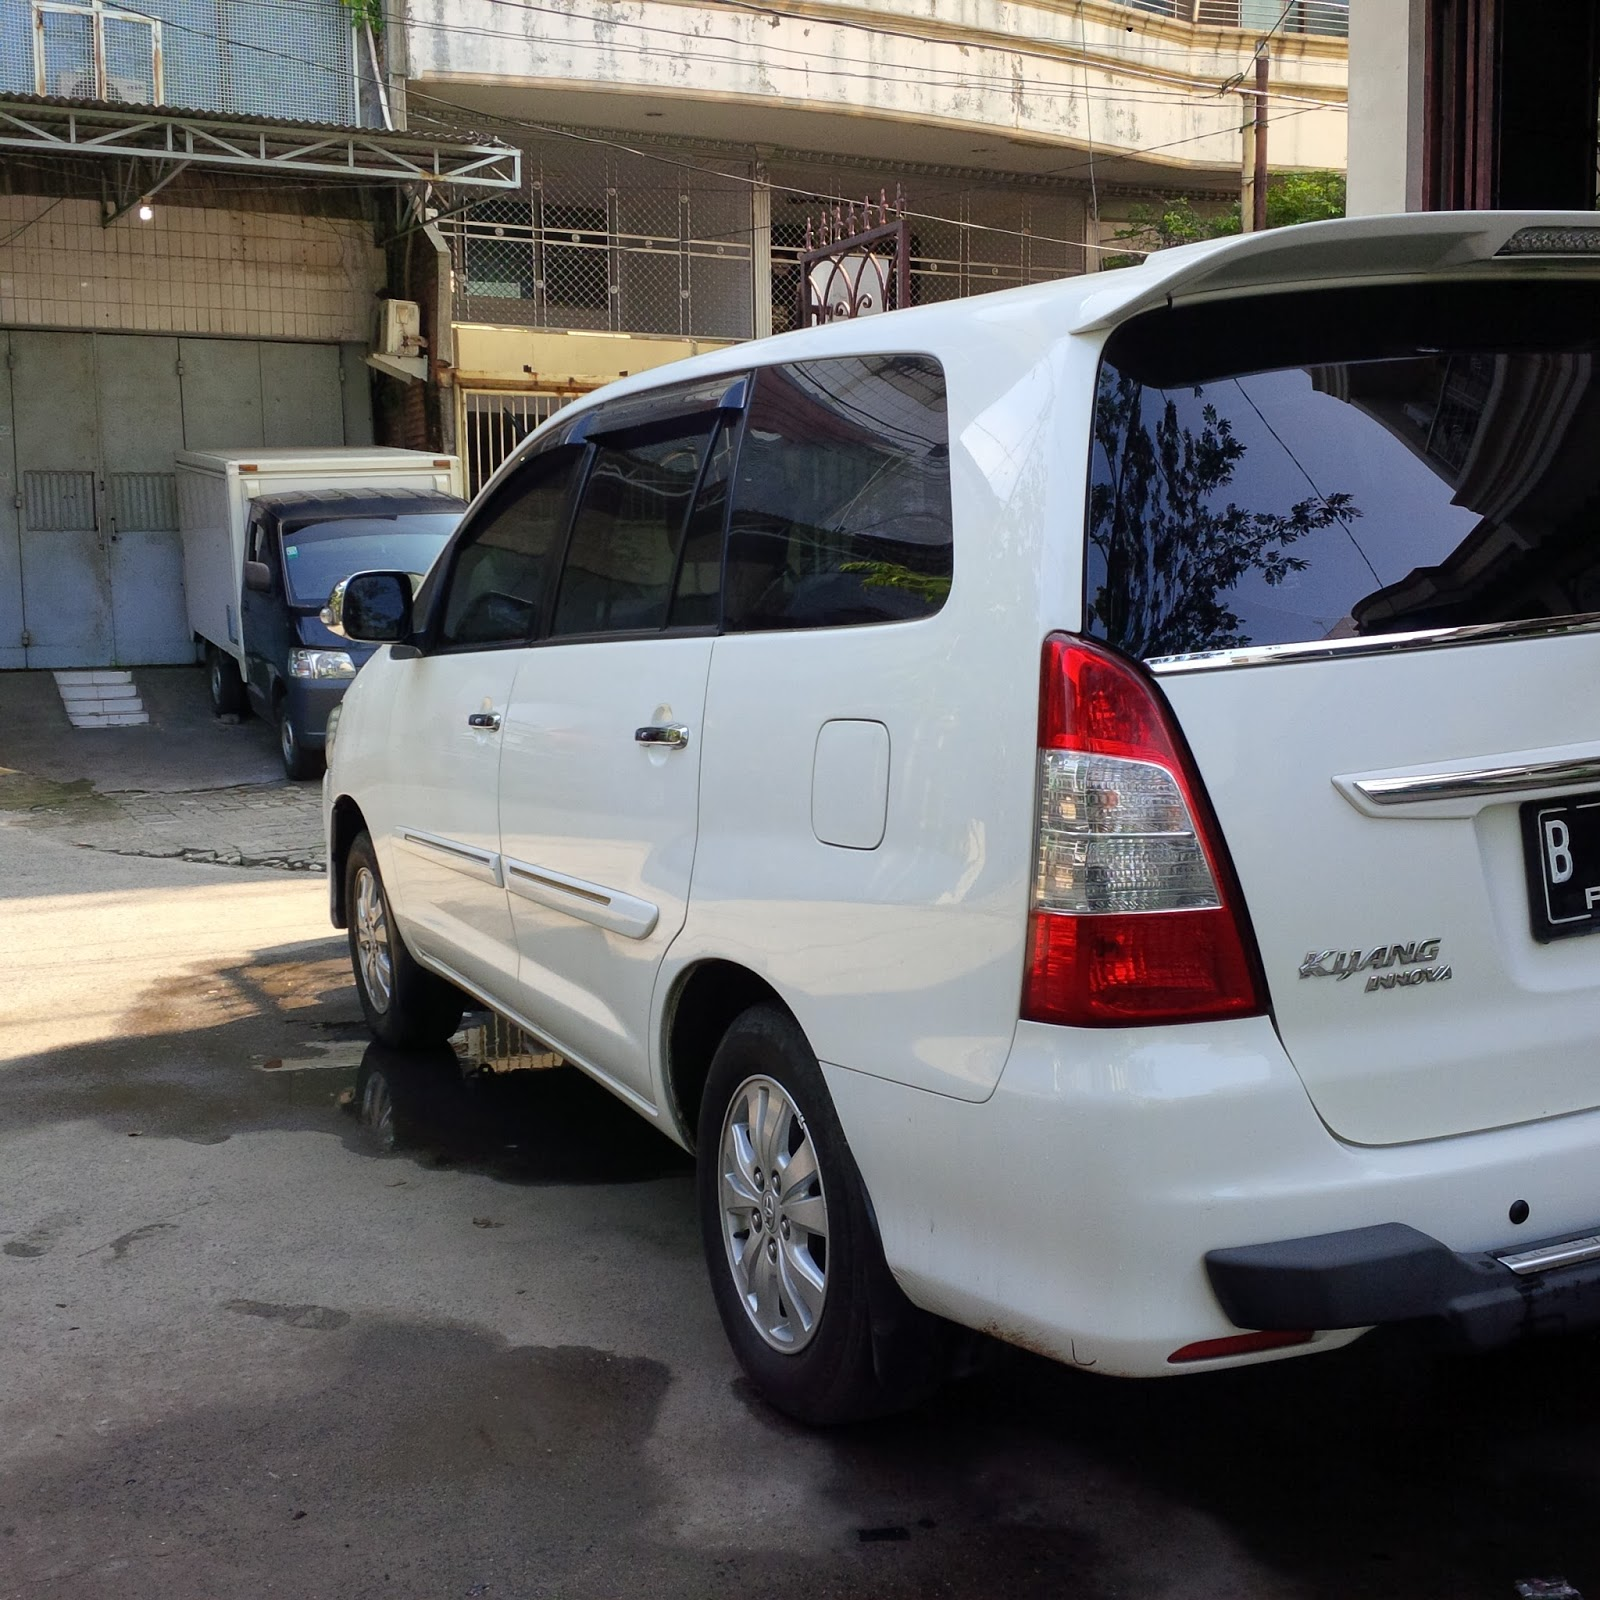 Pajak All New Kijang Innova 2016 Toyota Yaris Trd Sportivo Harga Ppd Motor Jakarta Jual Beli Mobil Bekas Dan Truk